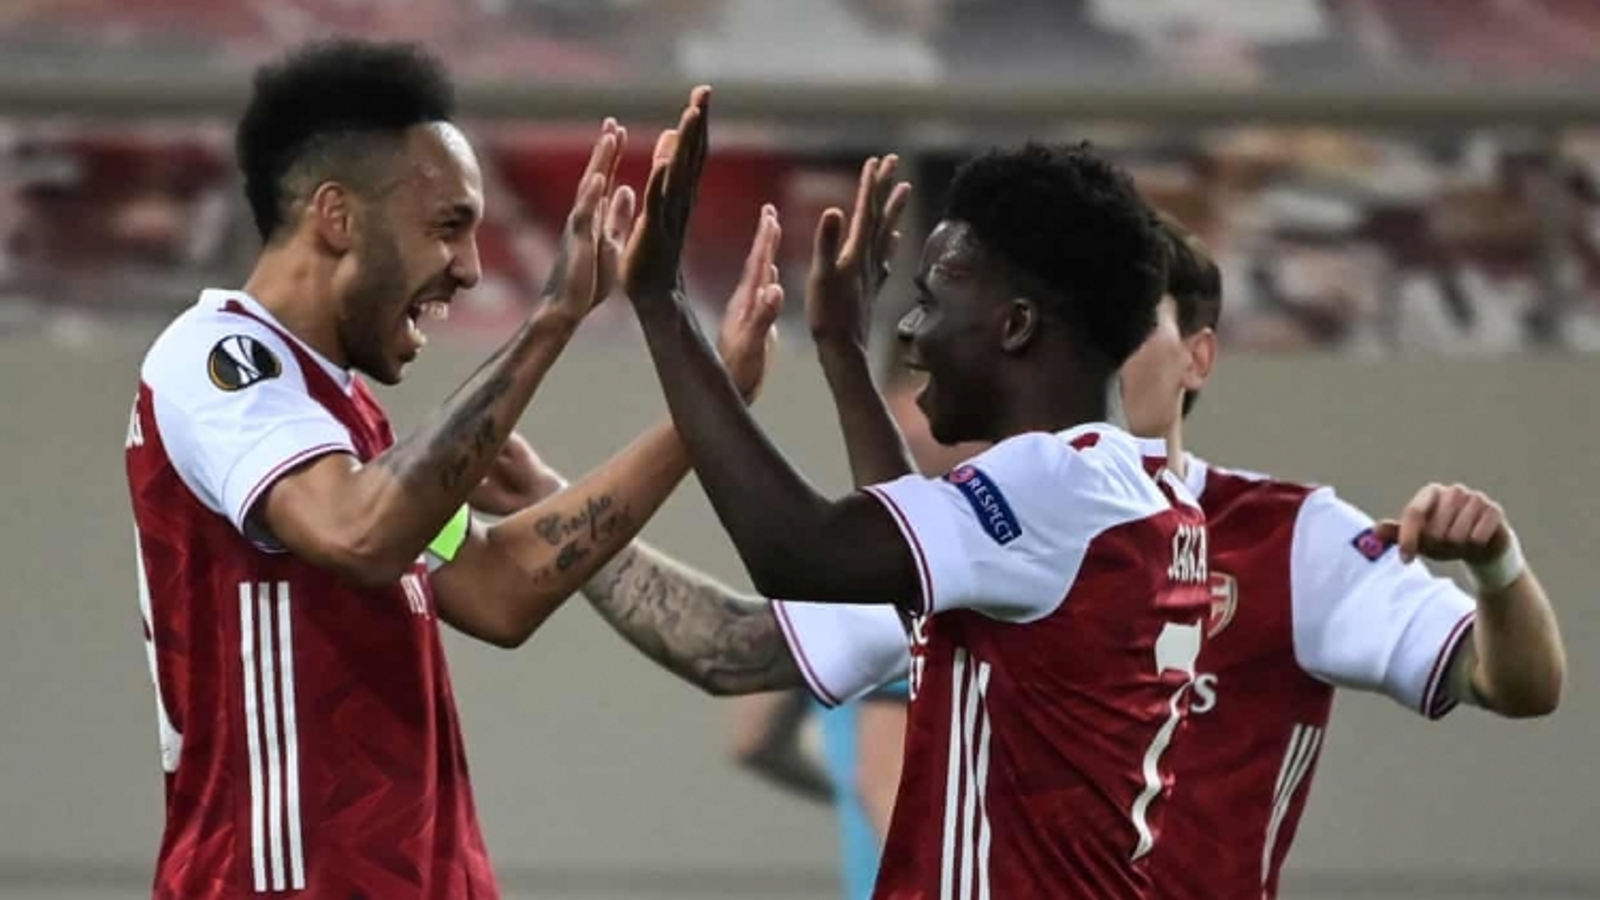 Europa League: Arsenal thắng kịch tính, MU hòa nhạt, Leicester thua sốc